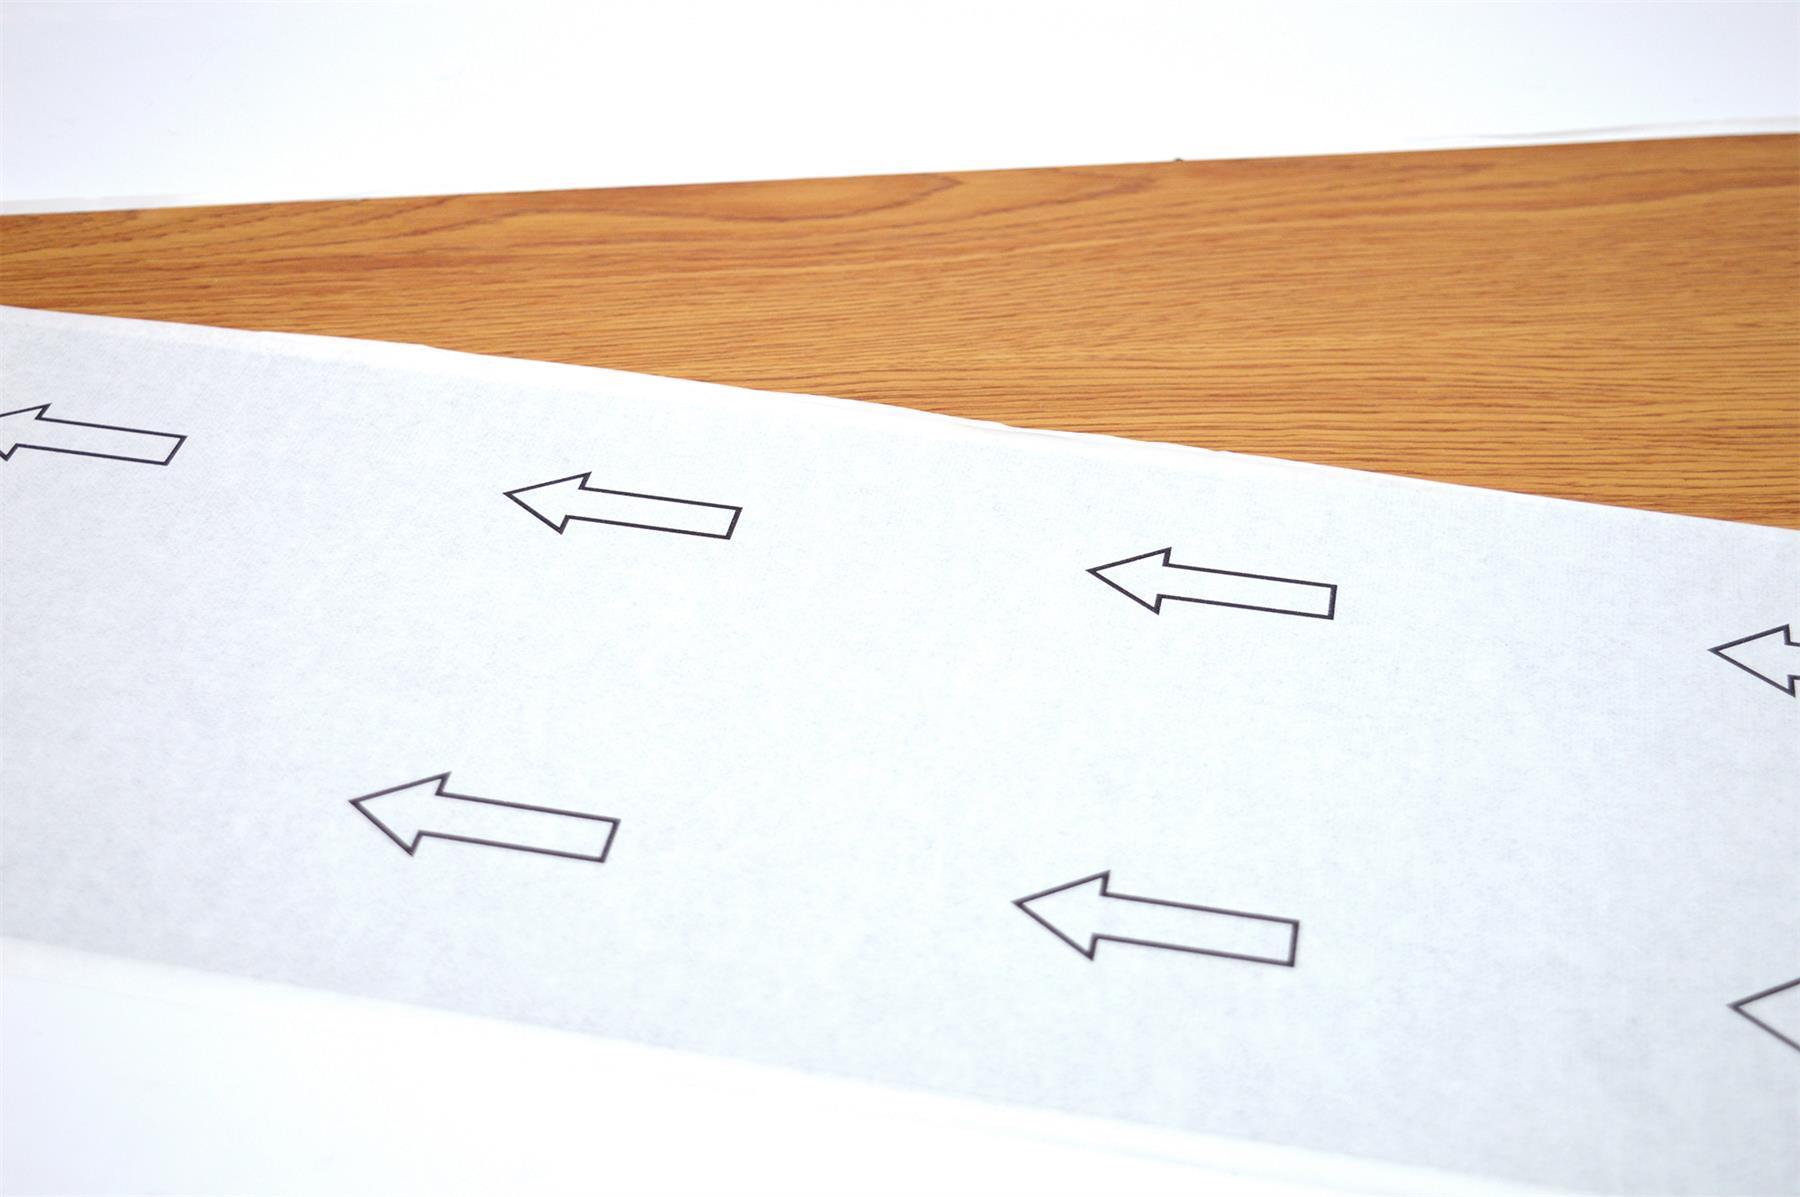 thumbnail 8 - Floor Planks Tiles Self Adhesive Vinyl Brown Wood Flooring Kitchen Bathroom